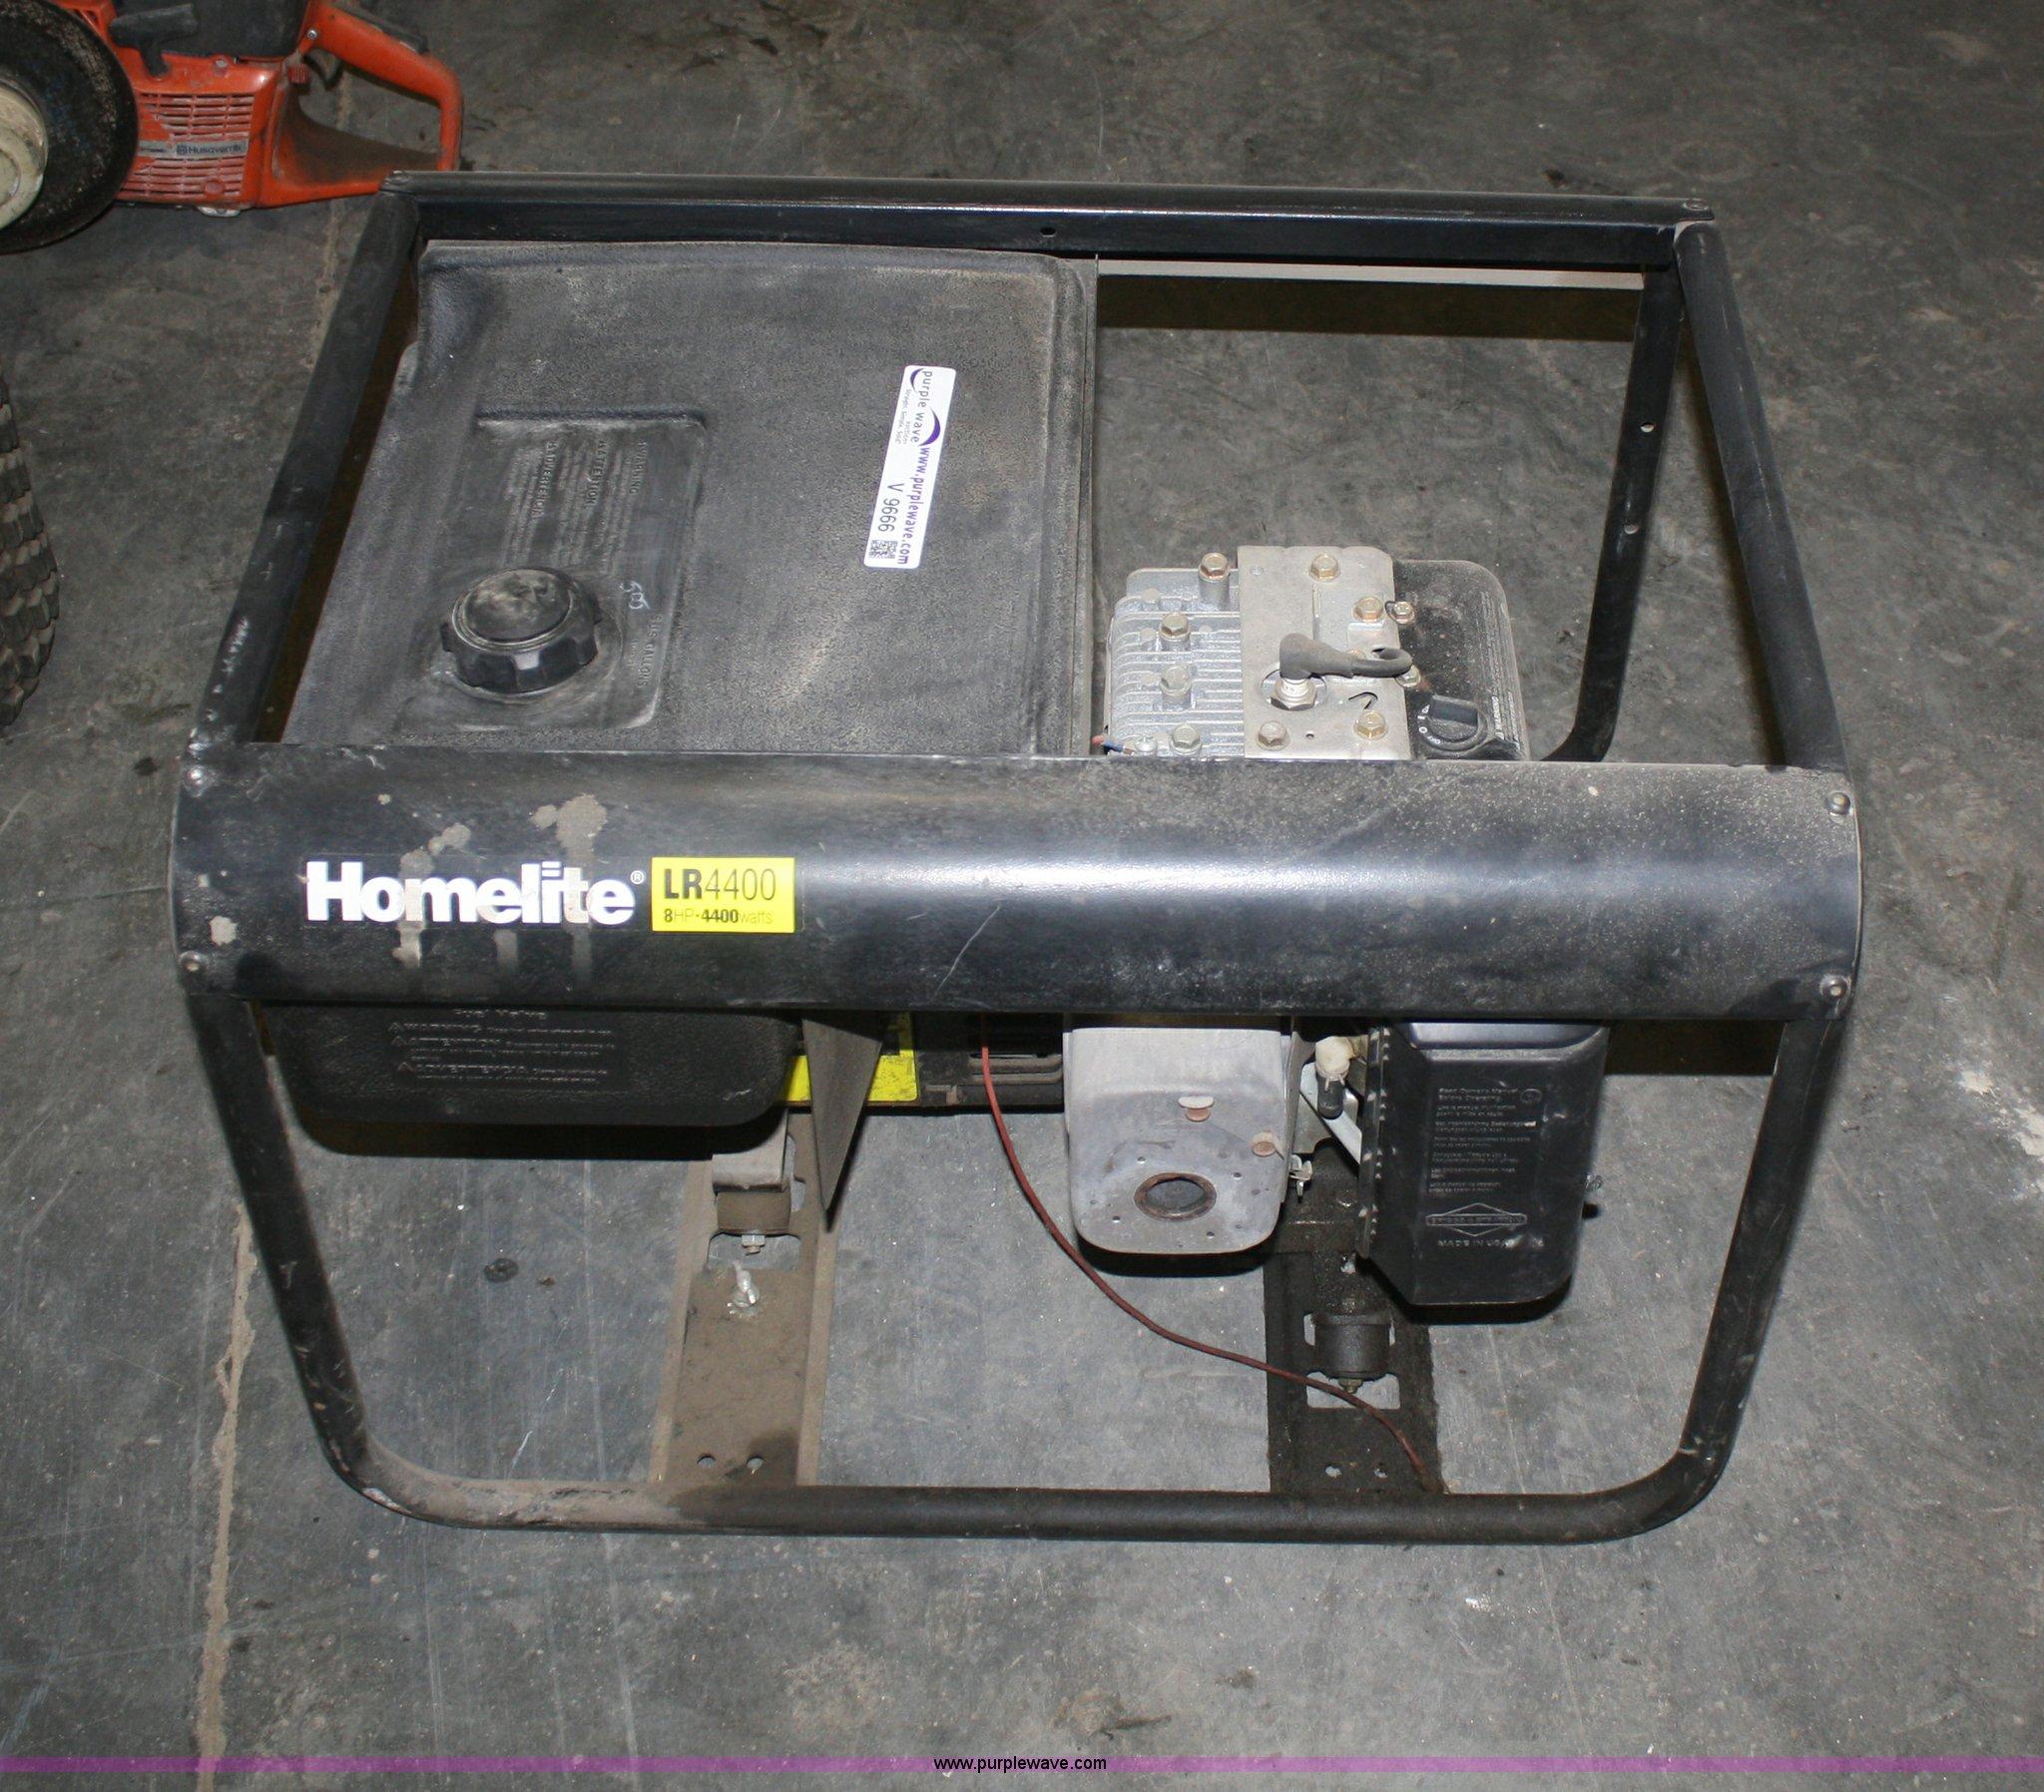 Stupendous Homelite Lr4400 Generator Item V9666 Sold May 1 Midwest Interior Design Ideas Gresisoteloinfo